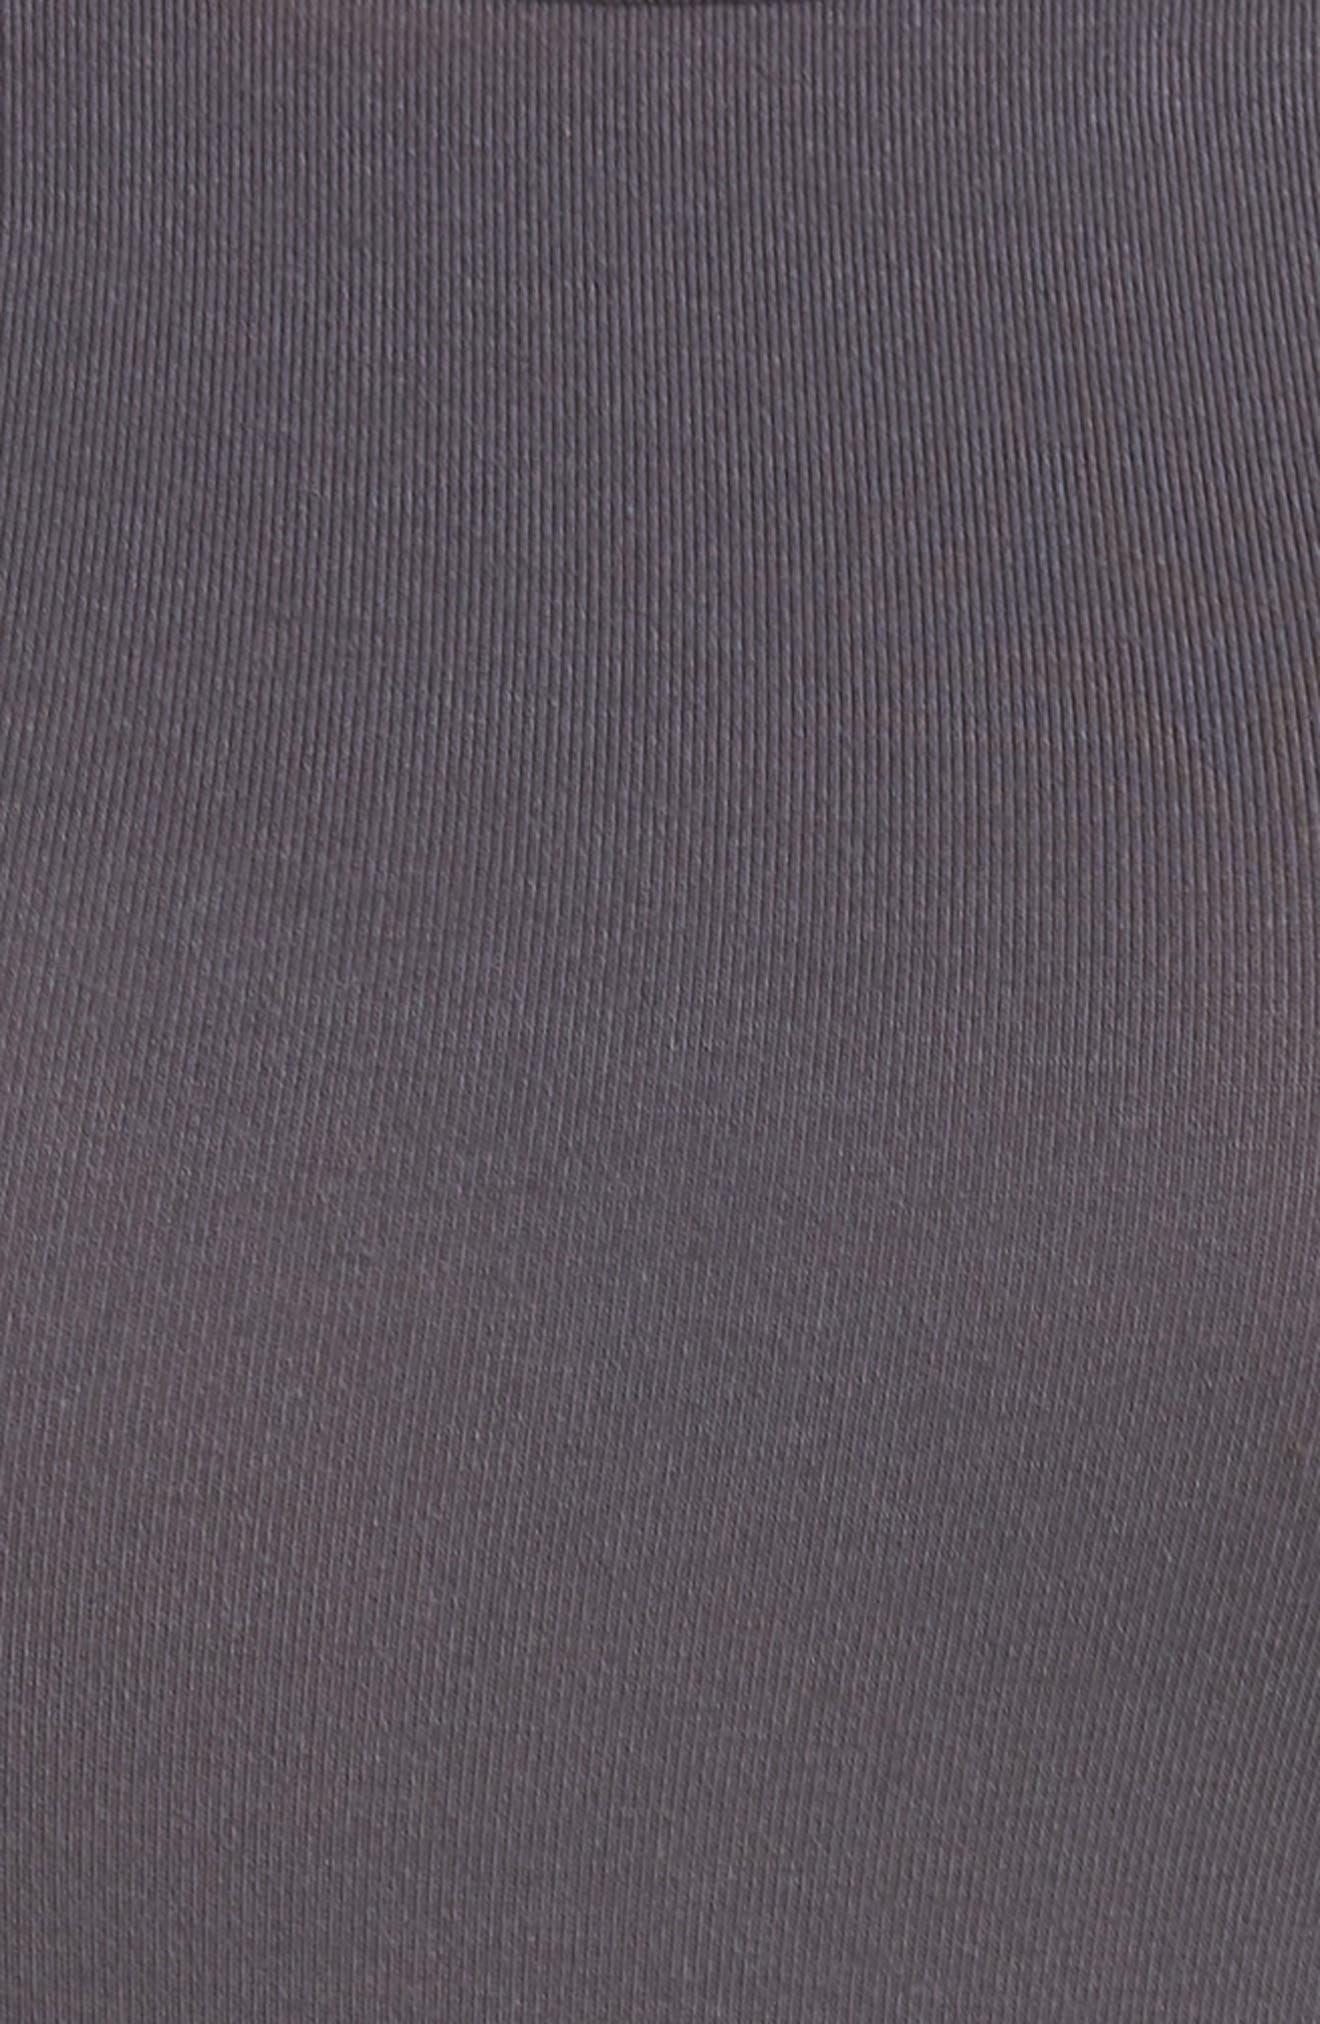 Scoop Back Thong Bodysuit,                             Alternate thumbnail 5, color,                             Gunmetal